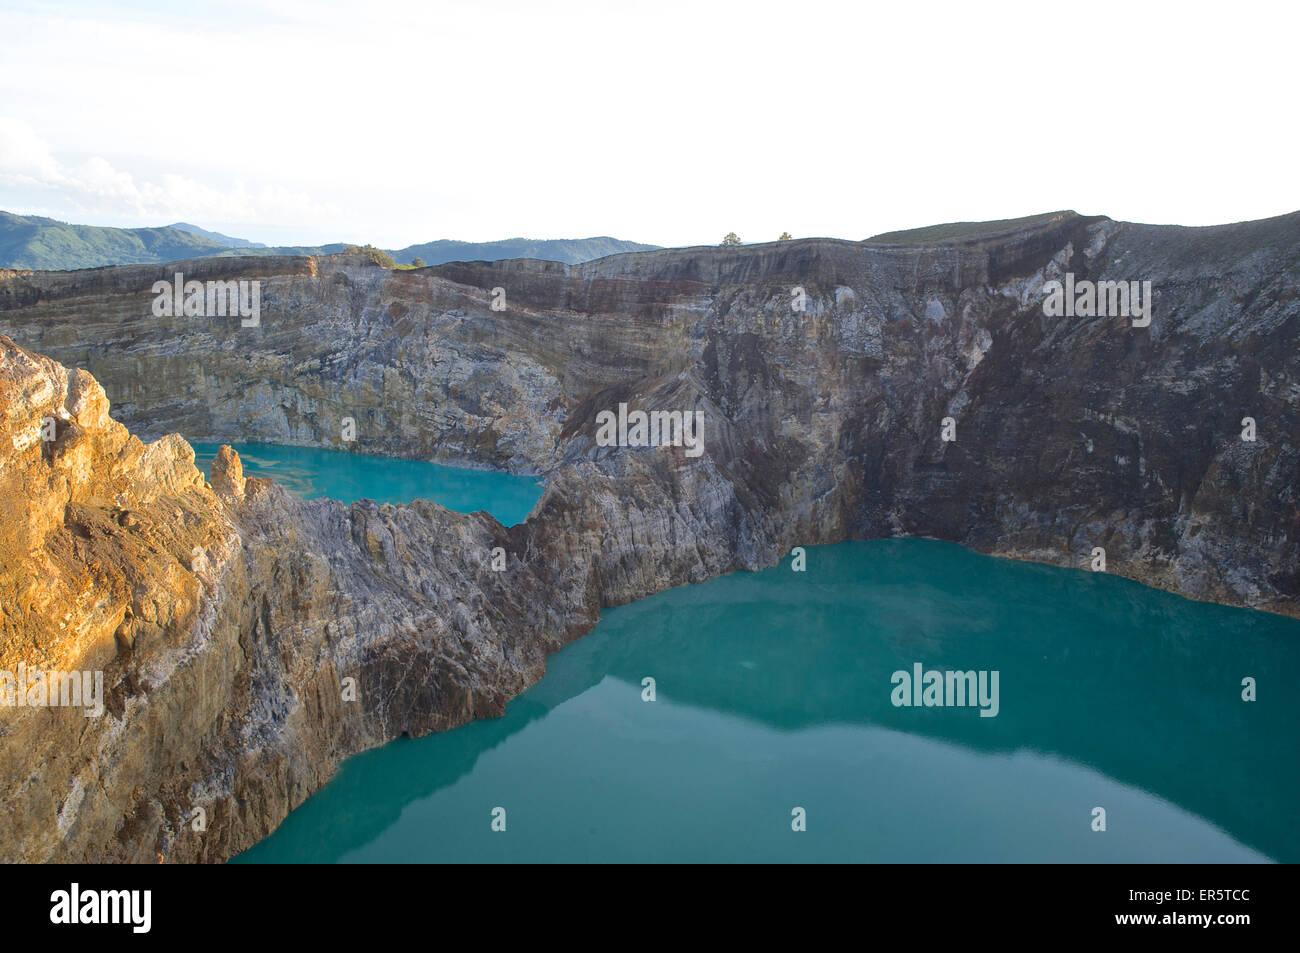 View down to the coloured lakes of vulcano Kelimutu, Flores, Nusa Tenggara Timur, Lesser Sunda Islands, Indonesia, - Stock Image